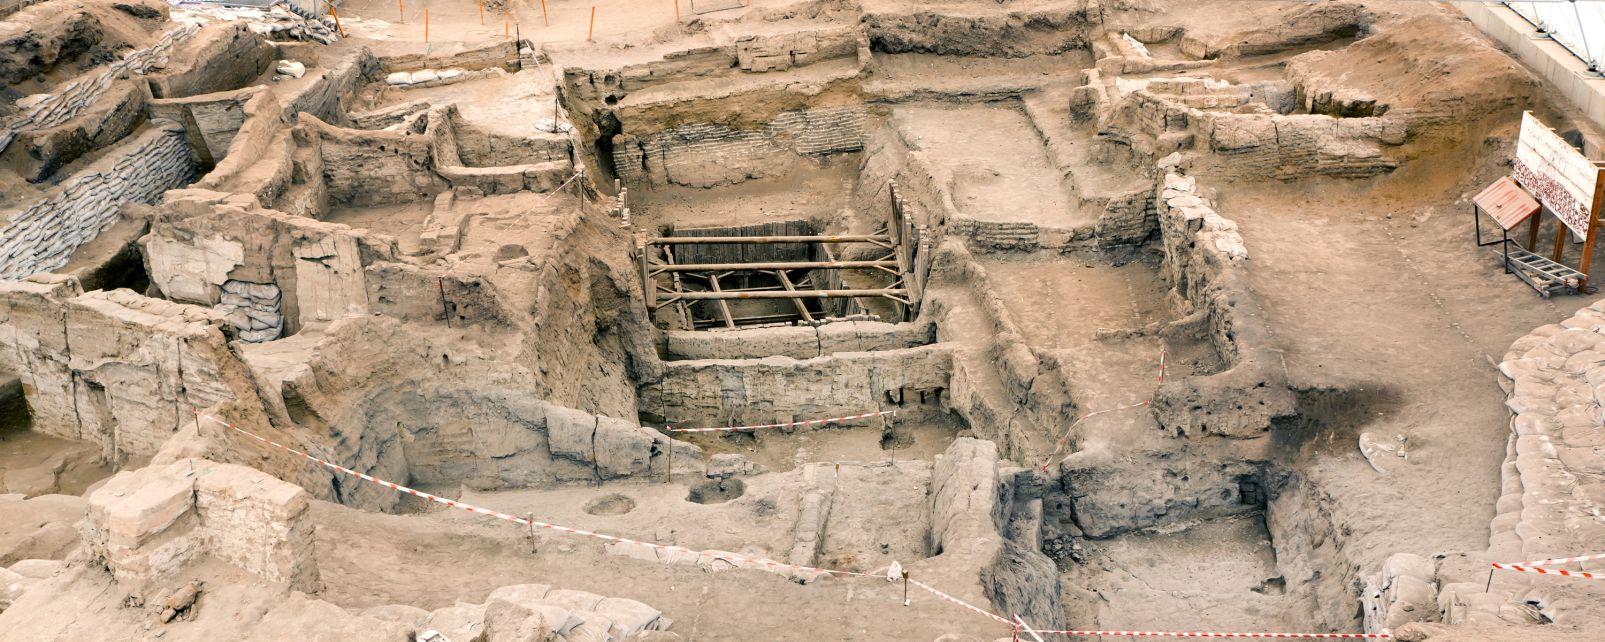 Les monuments, catalhoyuk, turquie, konya, moyen-orient, asie mineure, anatolie